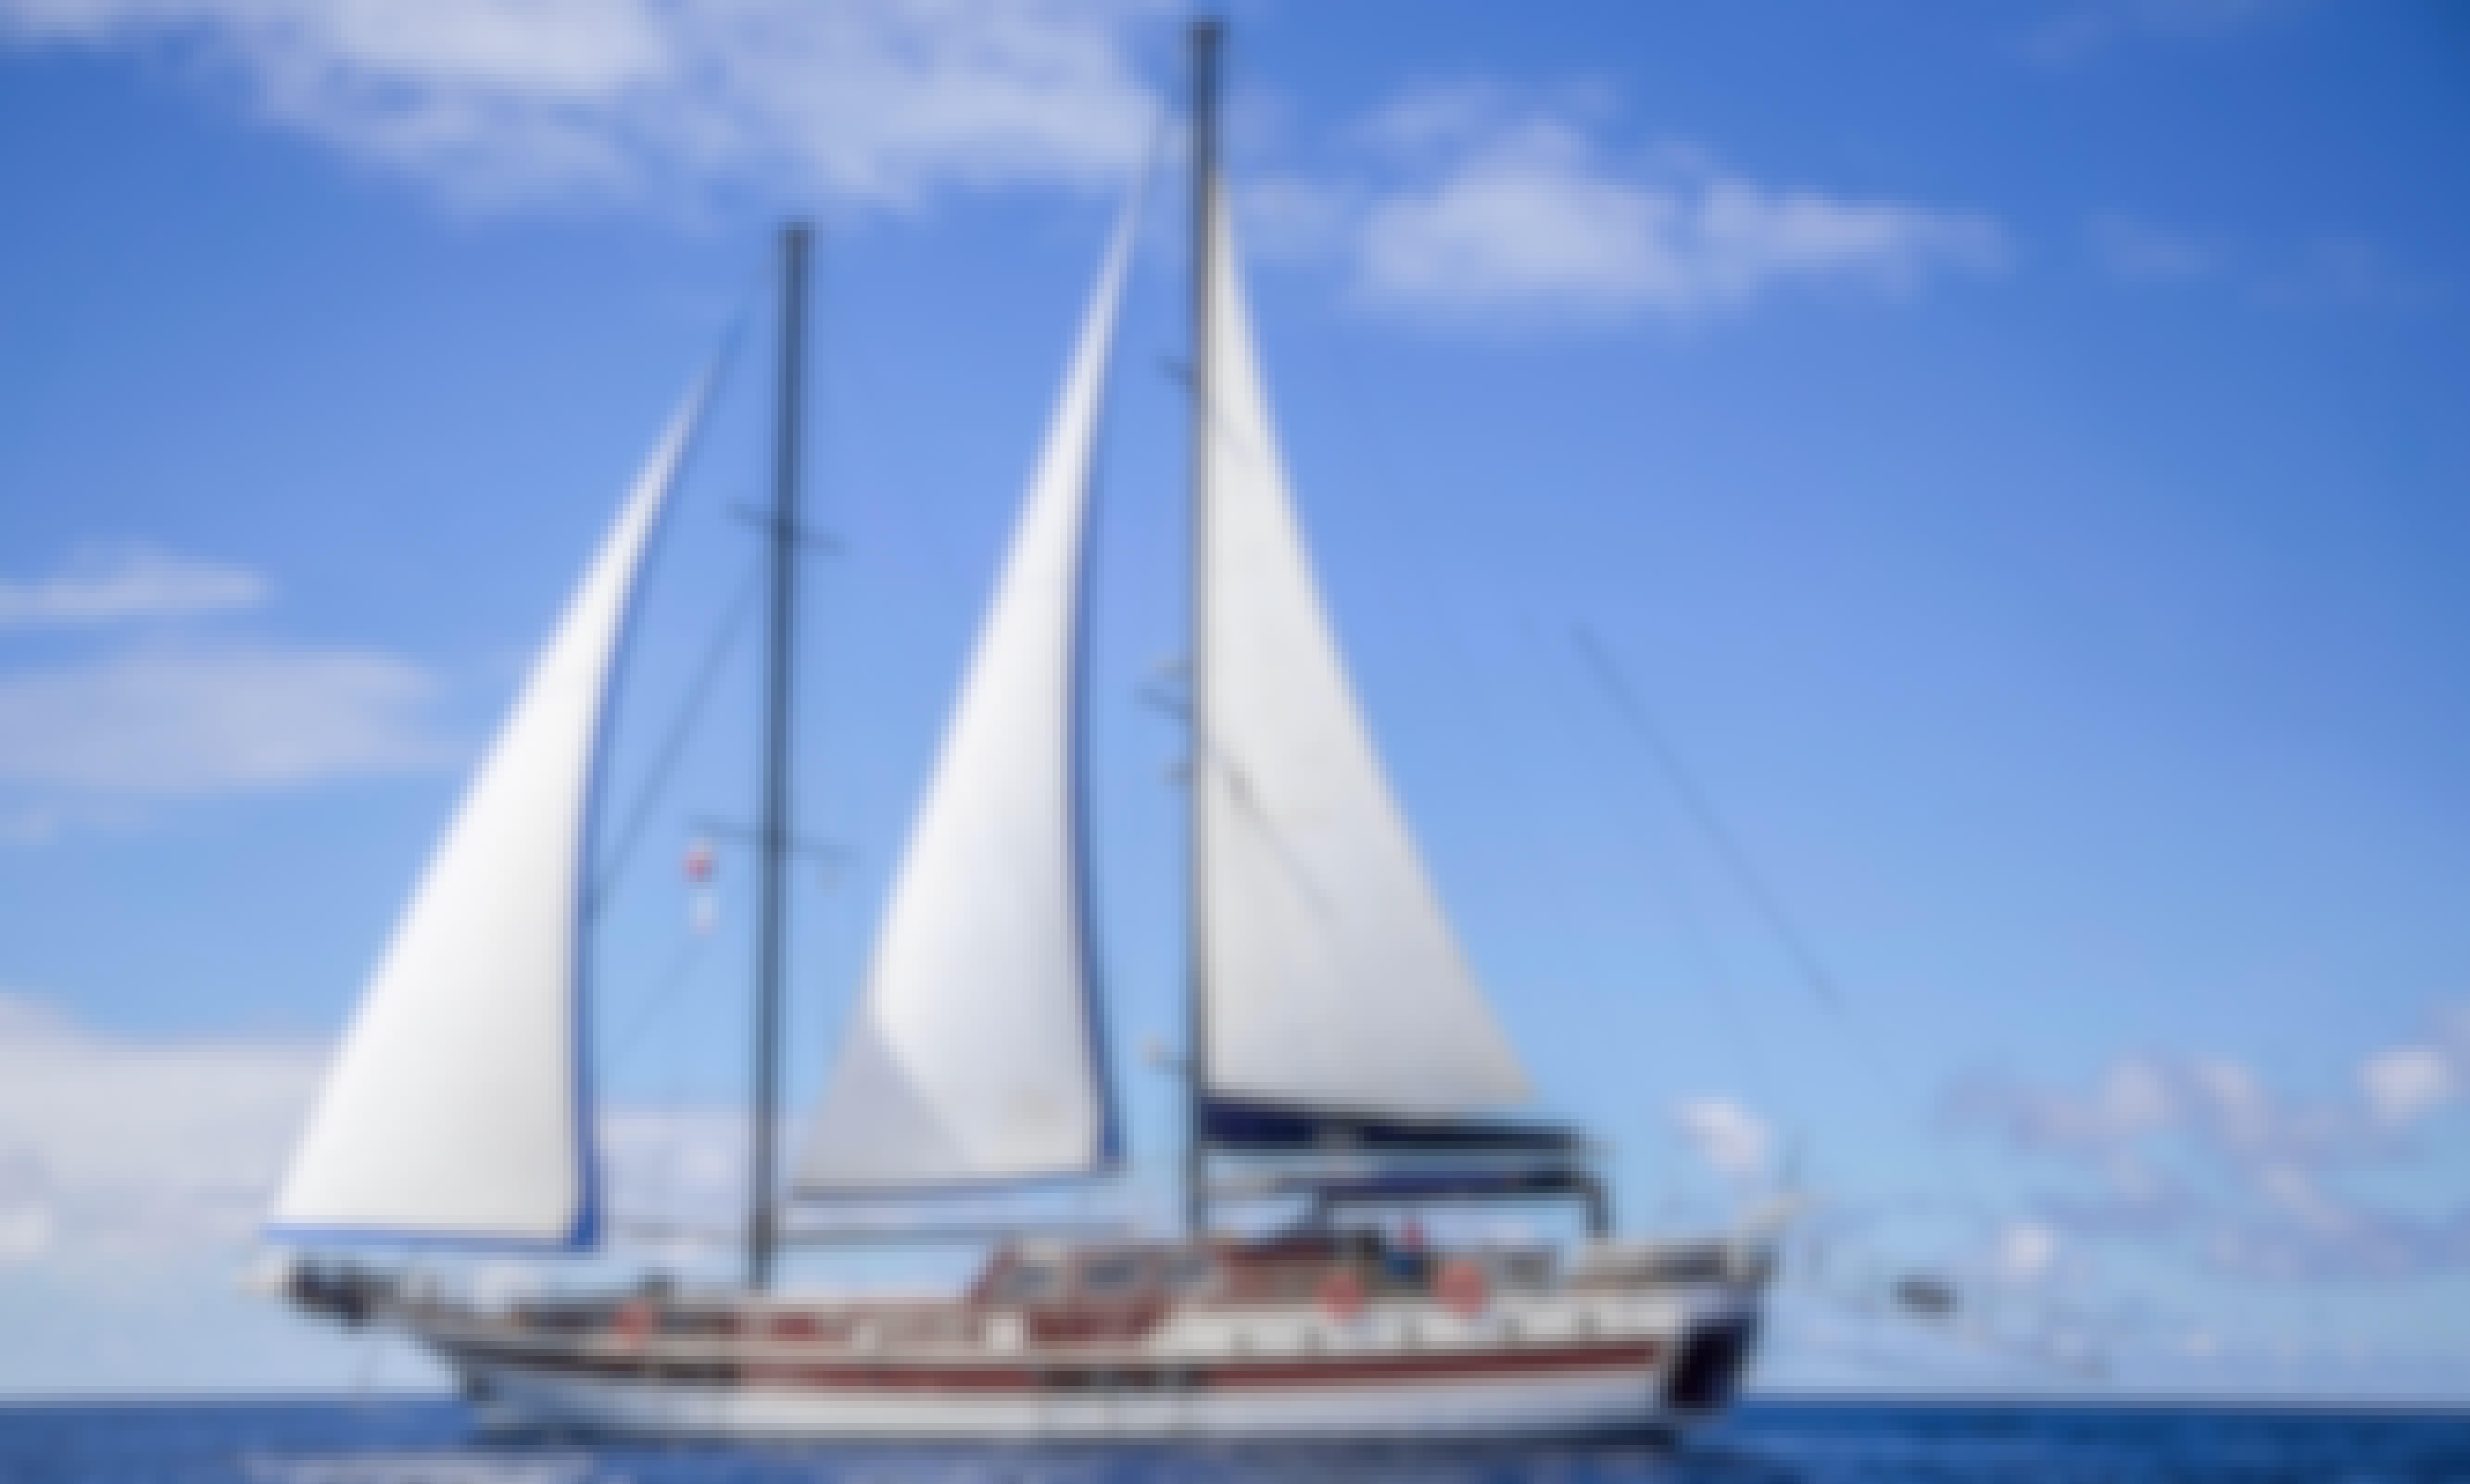 Sail on Turkish Gulet in San Blas islands,Panama